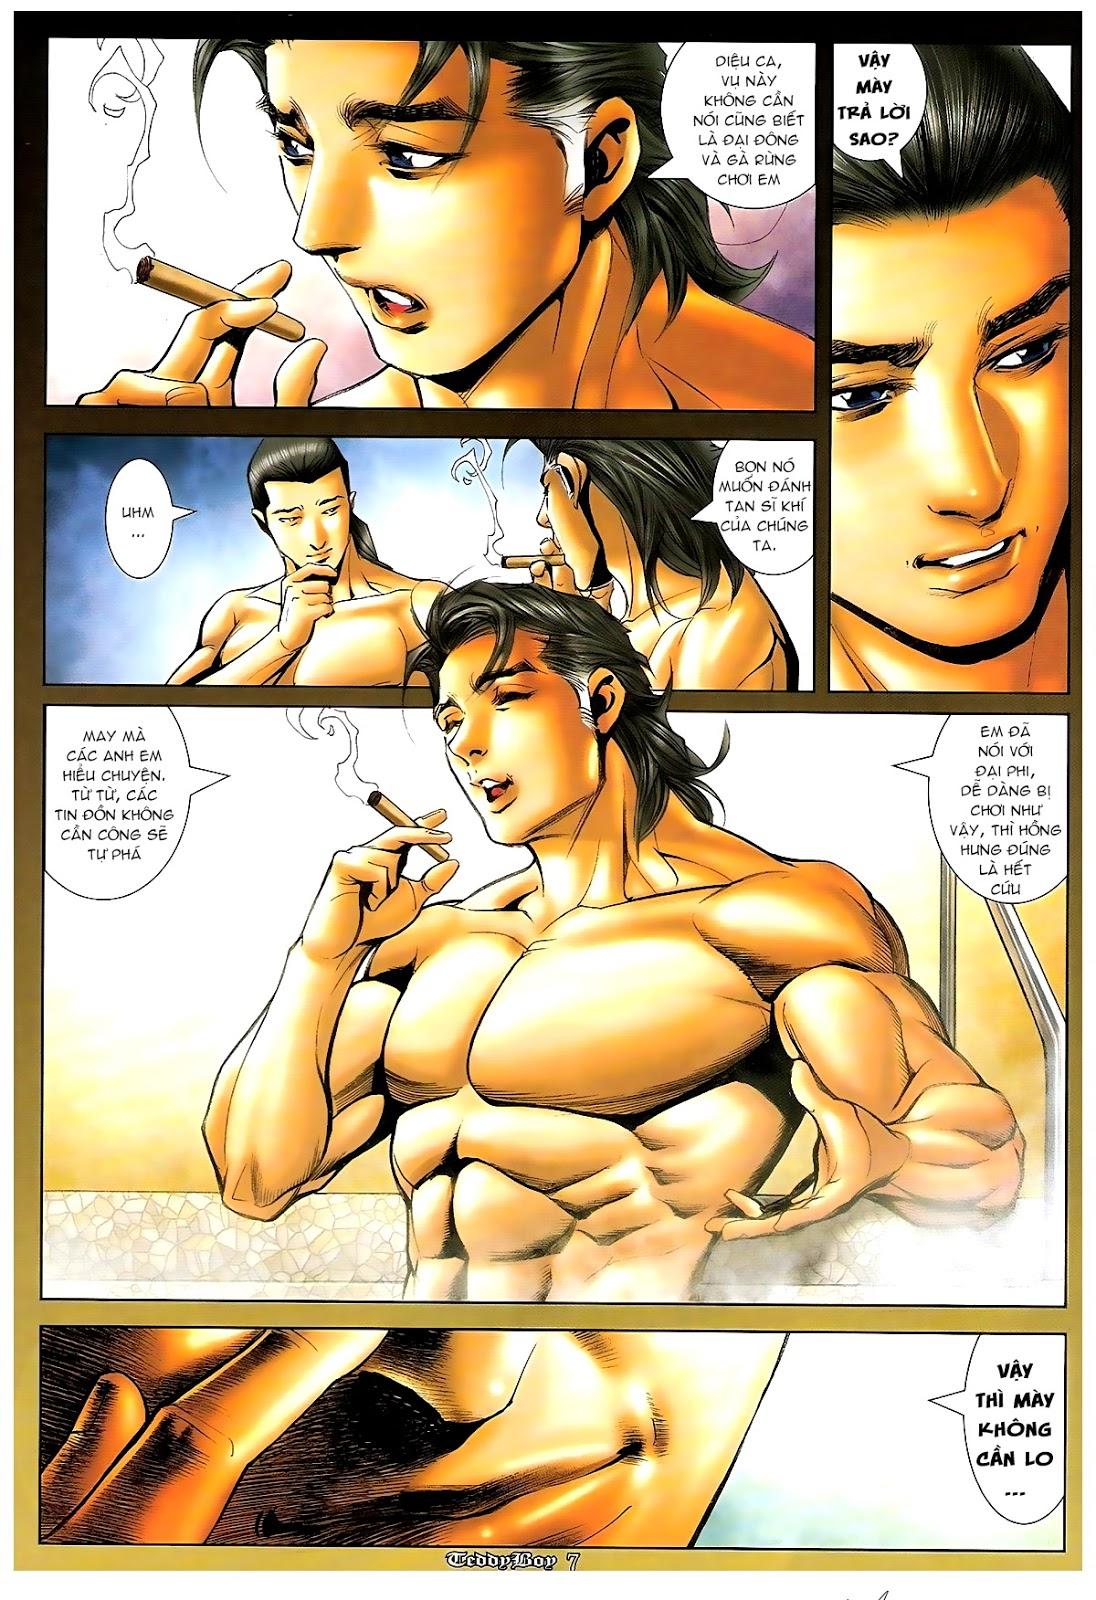 Người Trong Giang Hồ - Chapter 1209: Cai nghiện - Pic 5